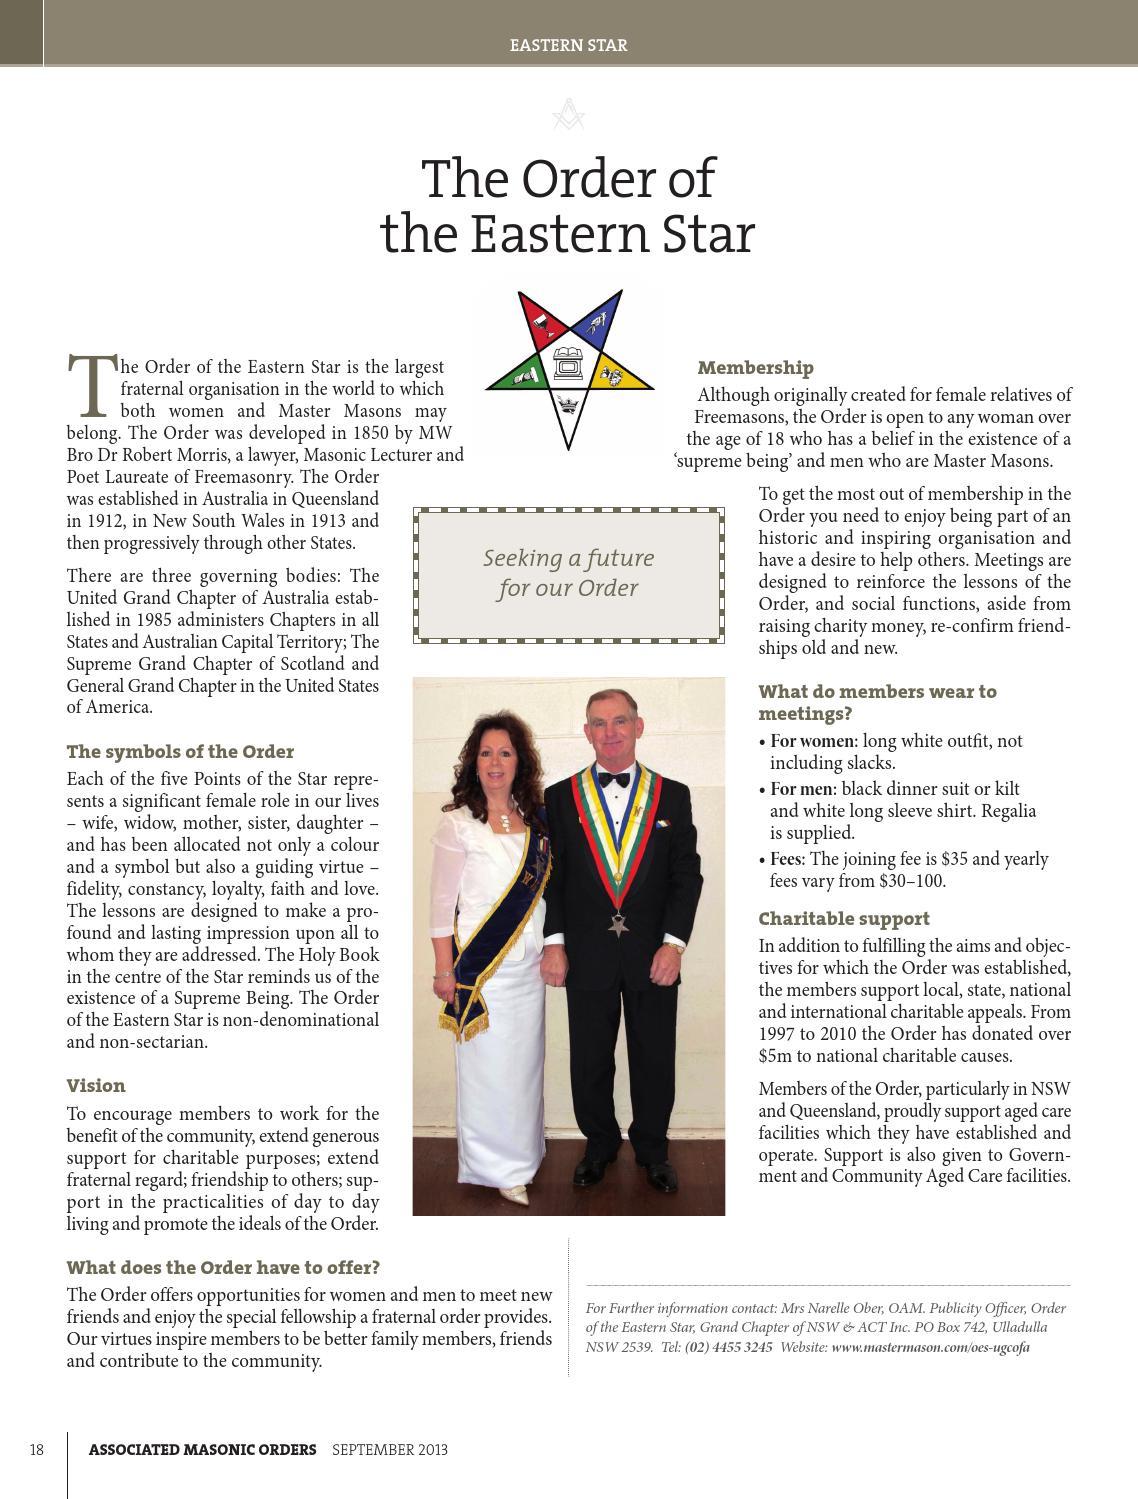 Freemason NSW & ACT – Associated Masonic Orders by APM Graphics